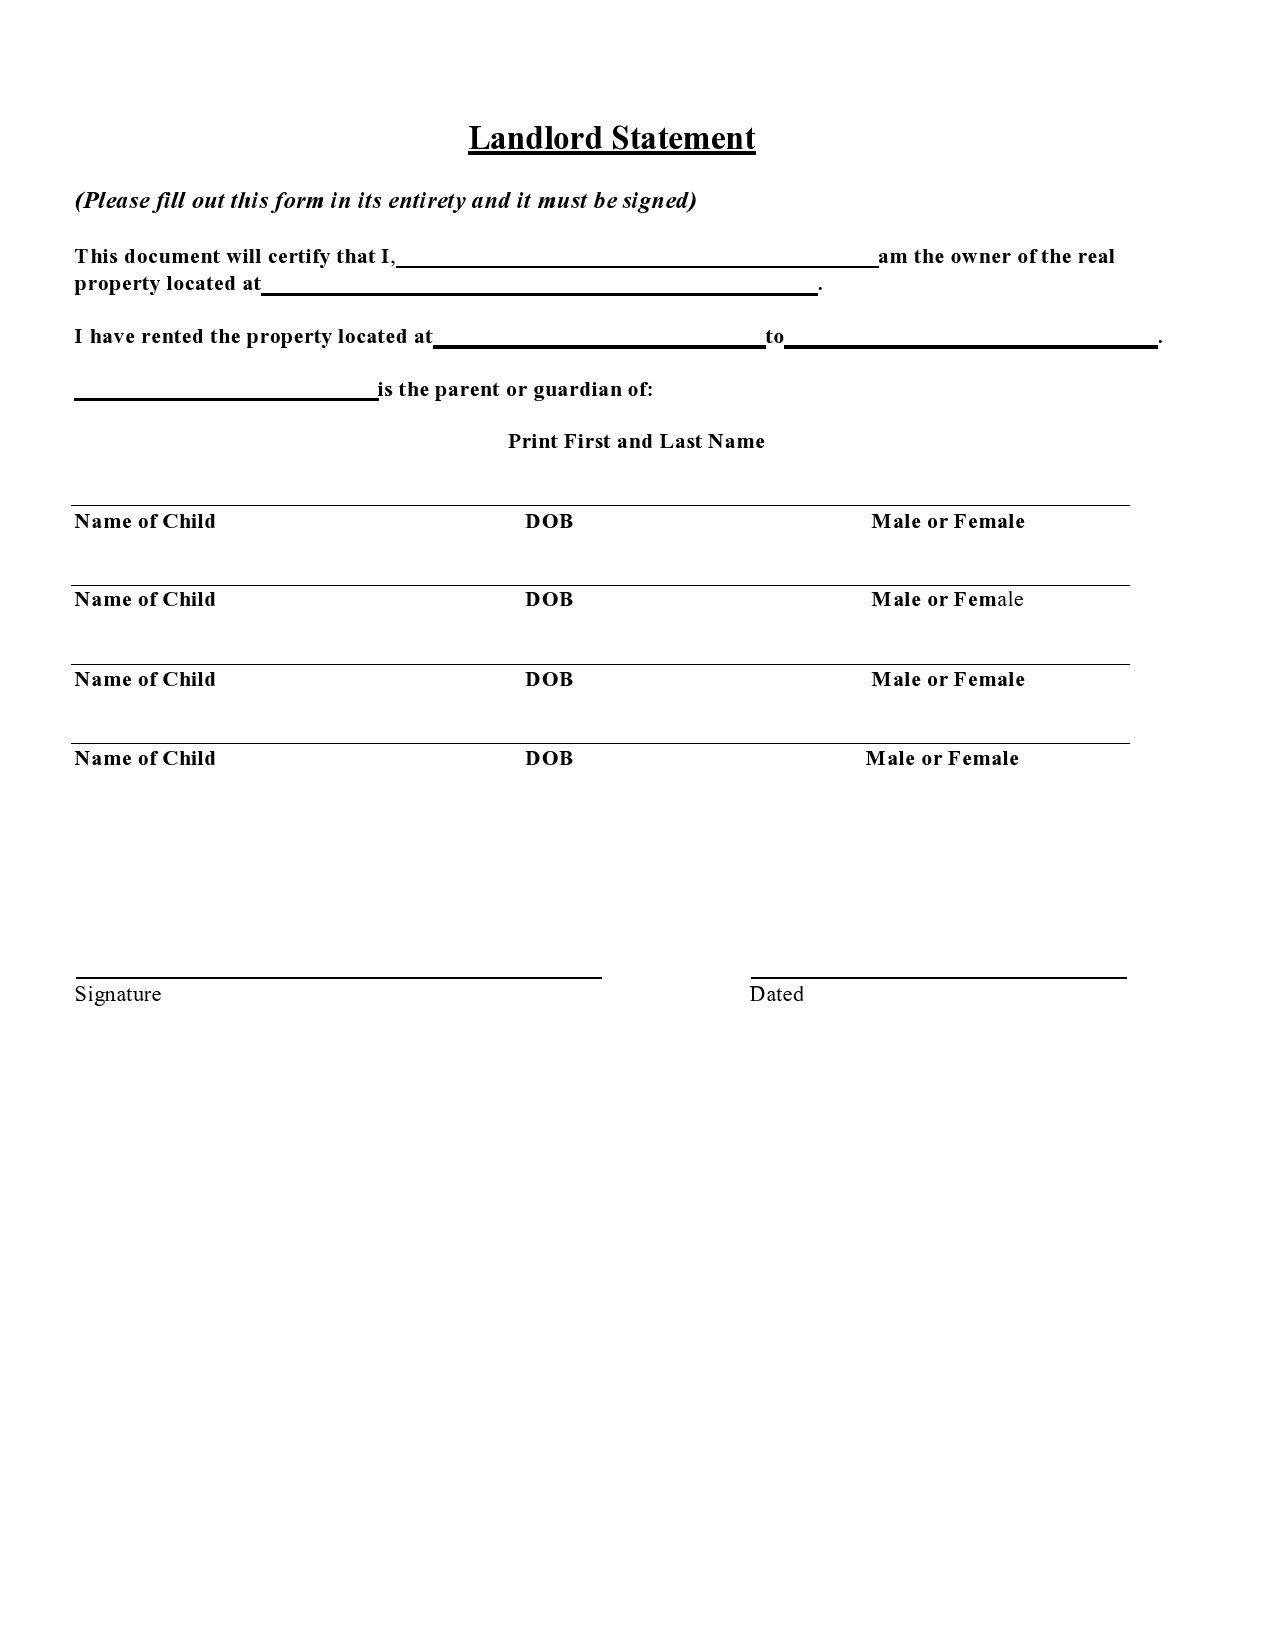 Free landlord statment 17